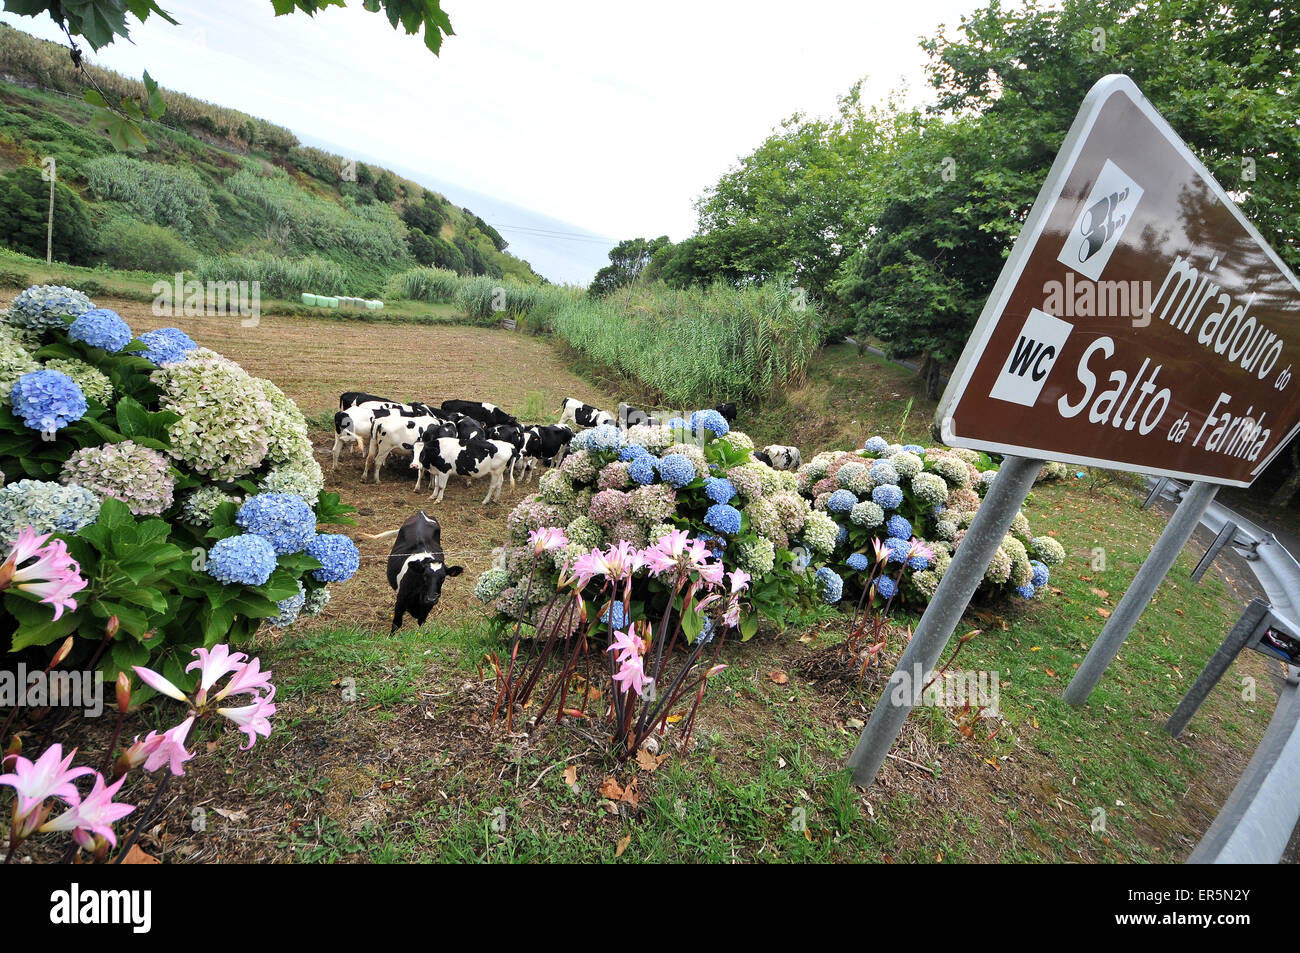 At view point Salto da Farinha, northeast coast, Island of Sao Miguel, Azores, Portugal - Stock Image